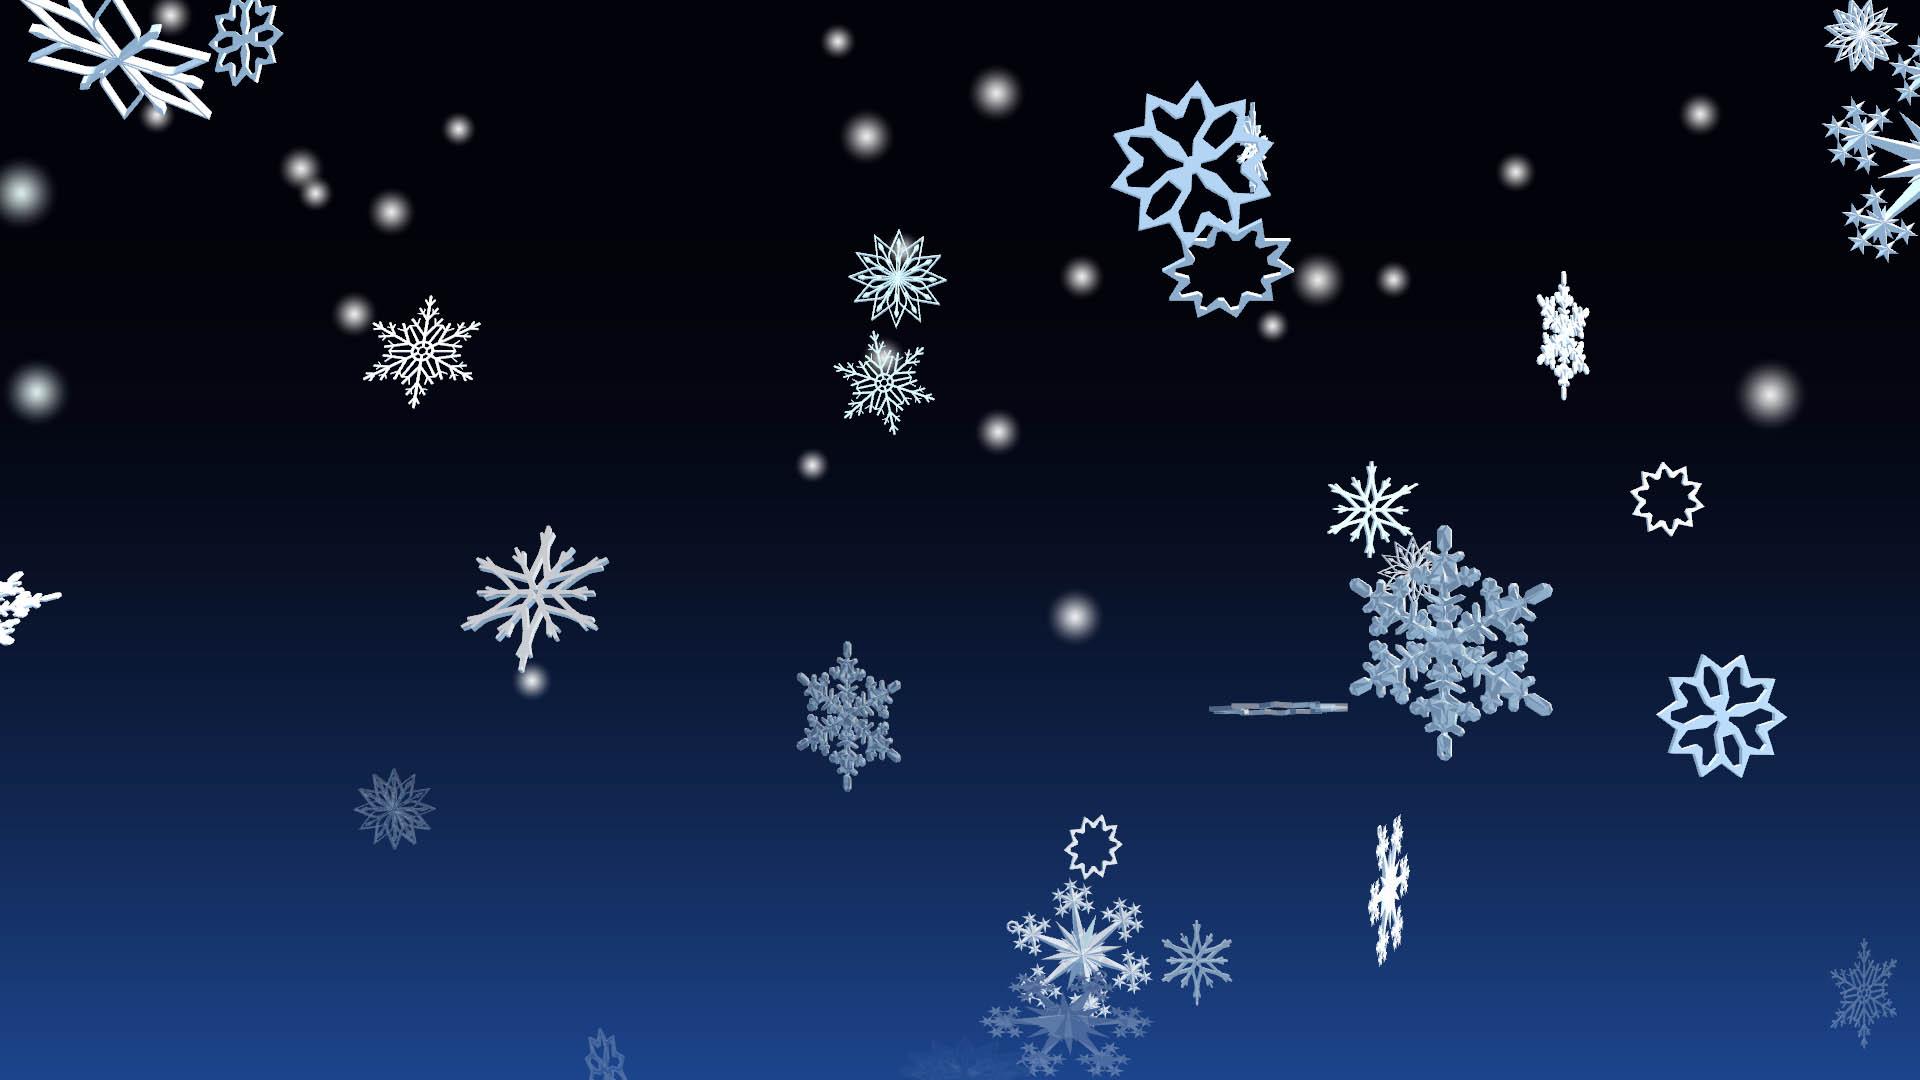 3d Winter Snowflakes Screensaver For Windows 3d Snowflakes Screensaver